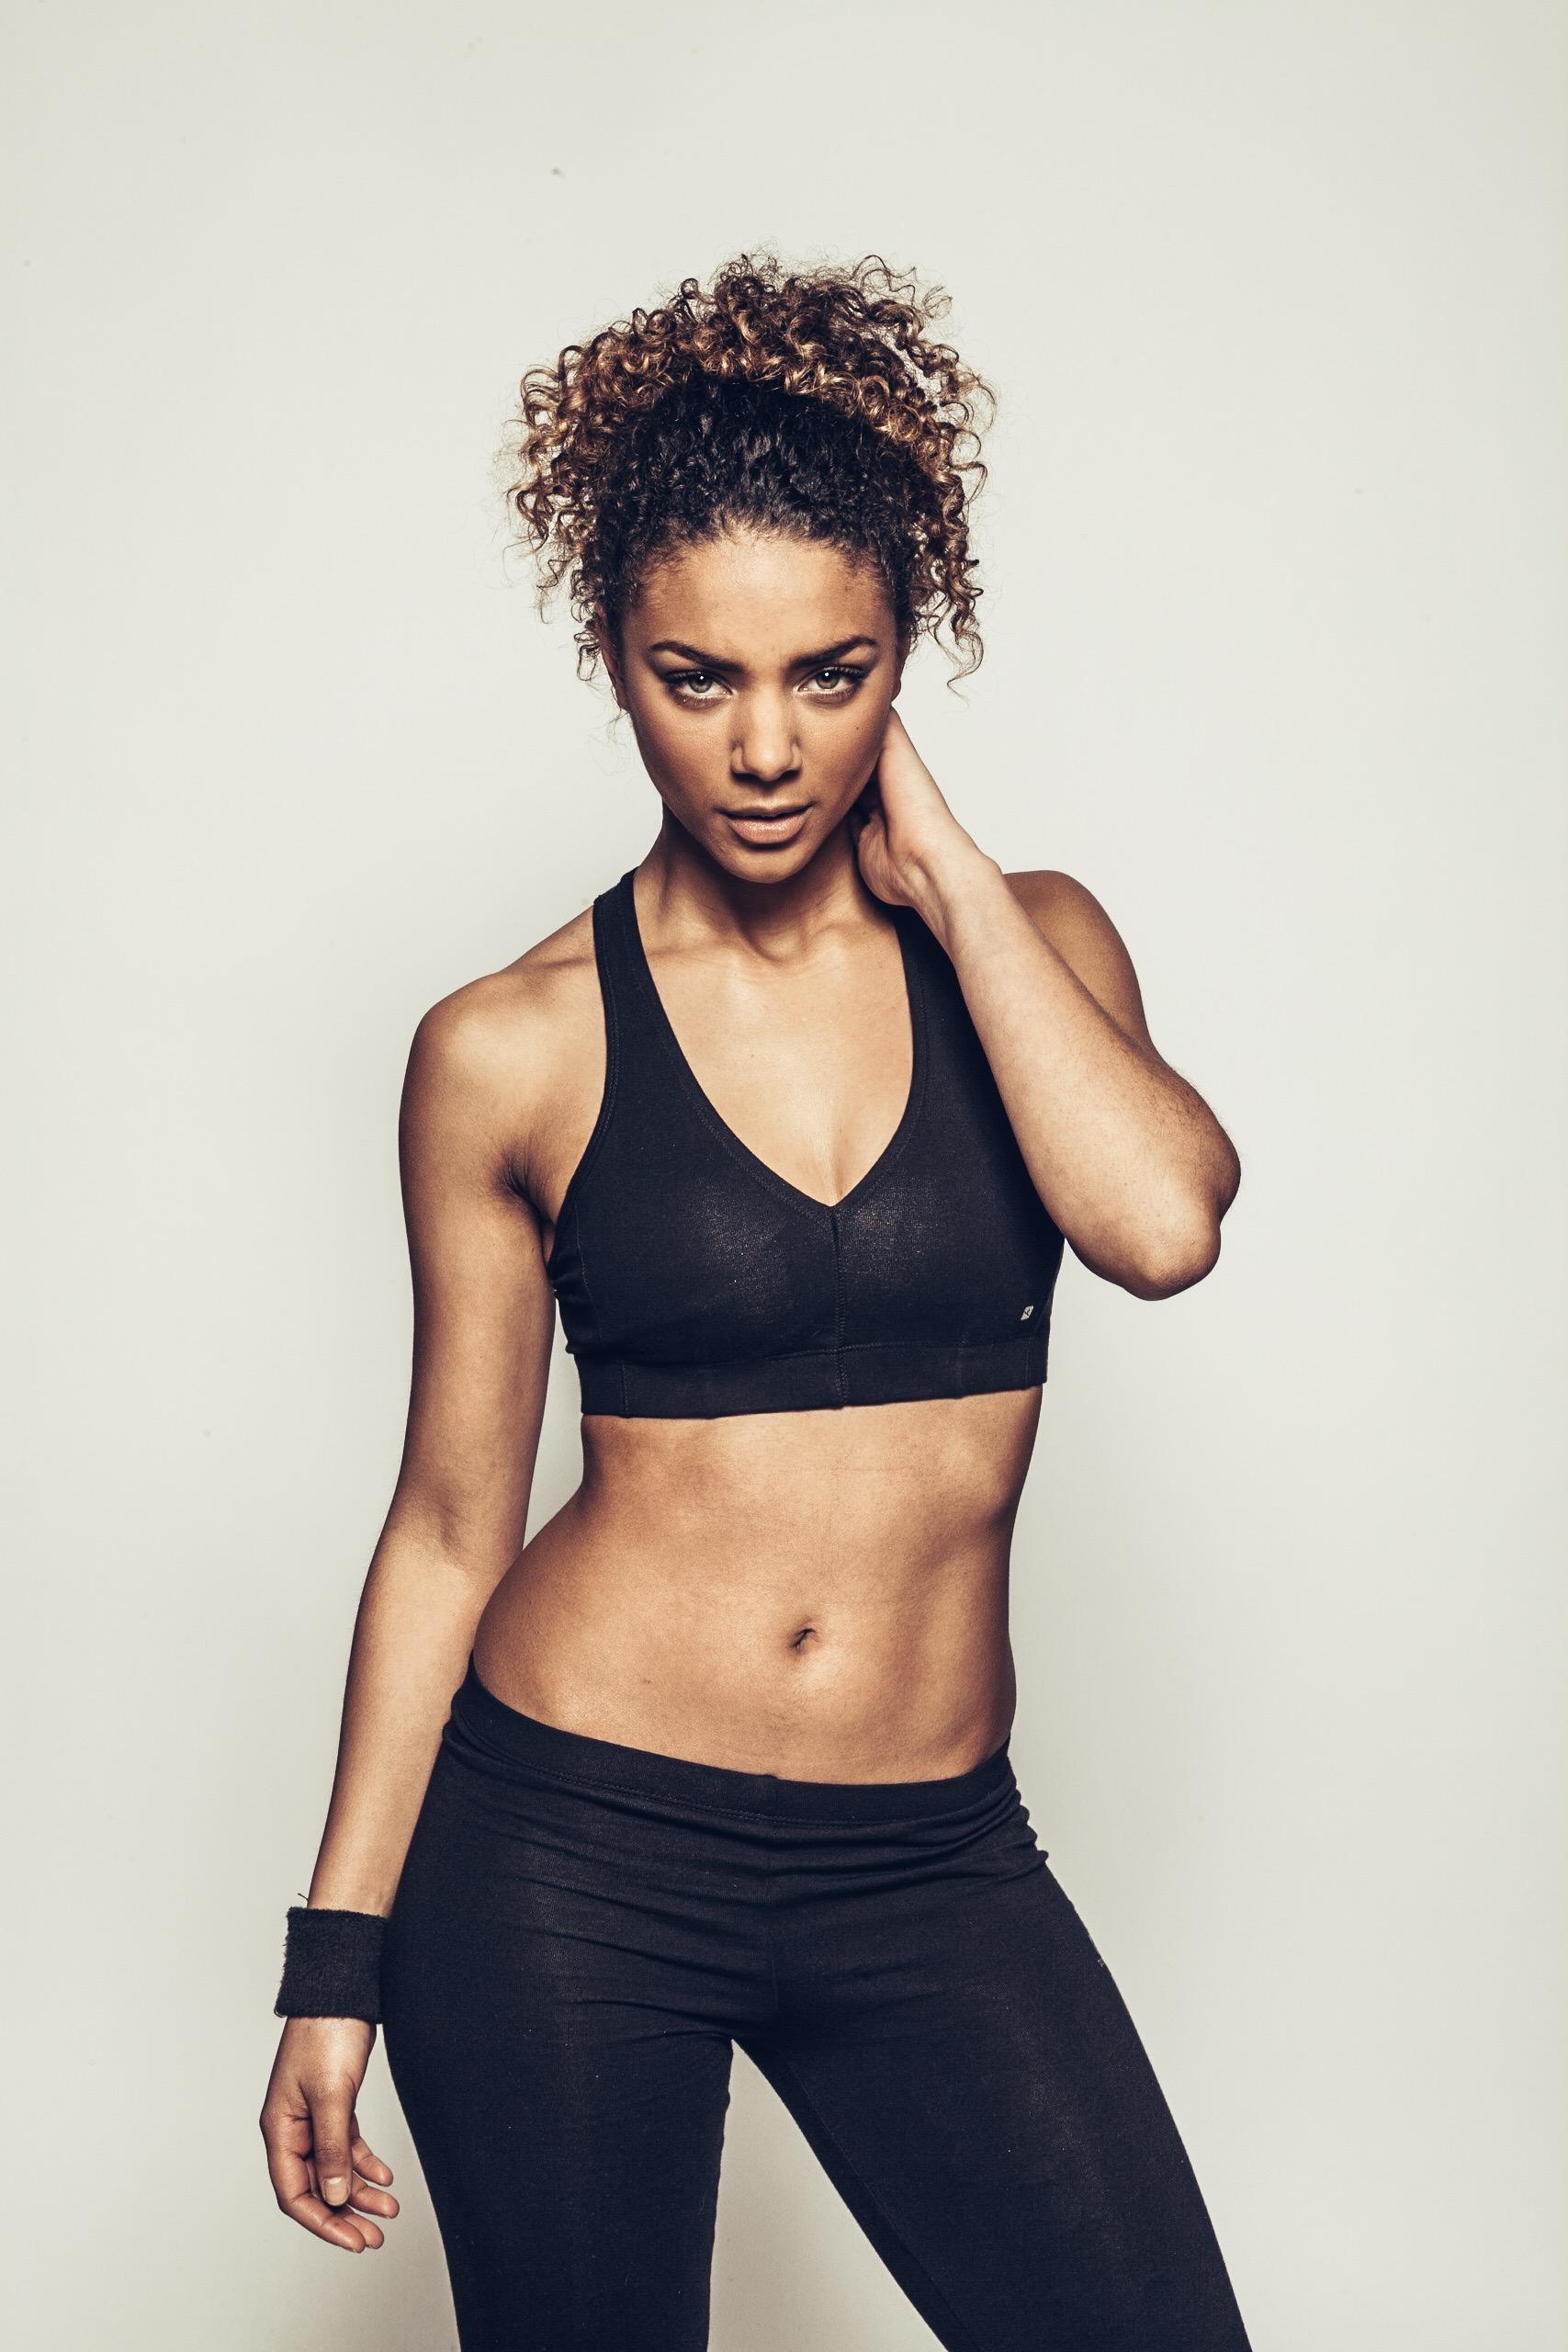 Estelle L. @Sport Models